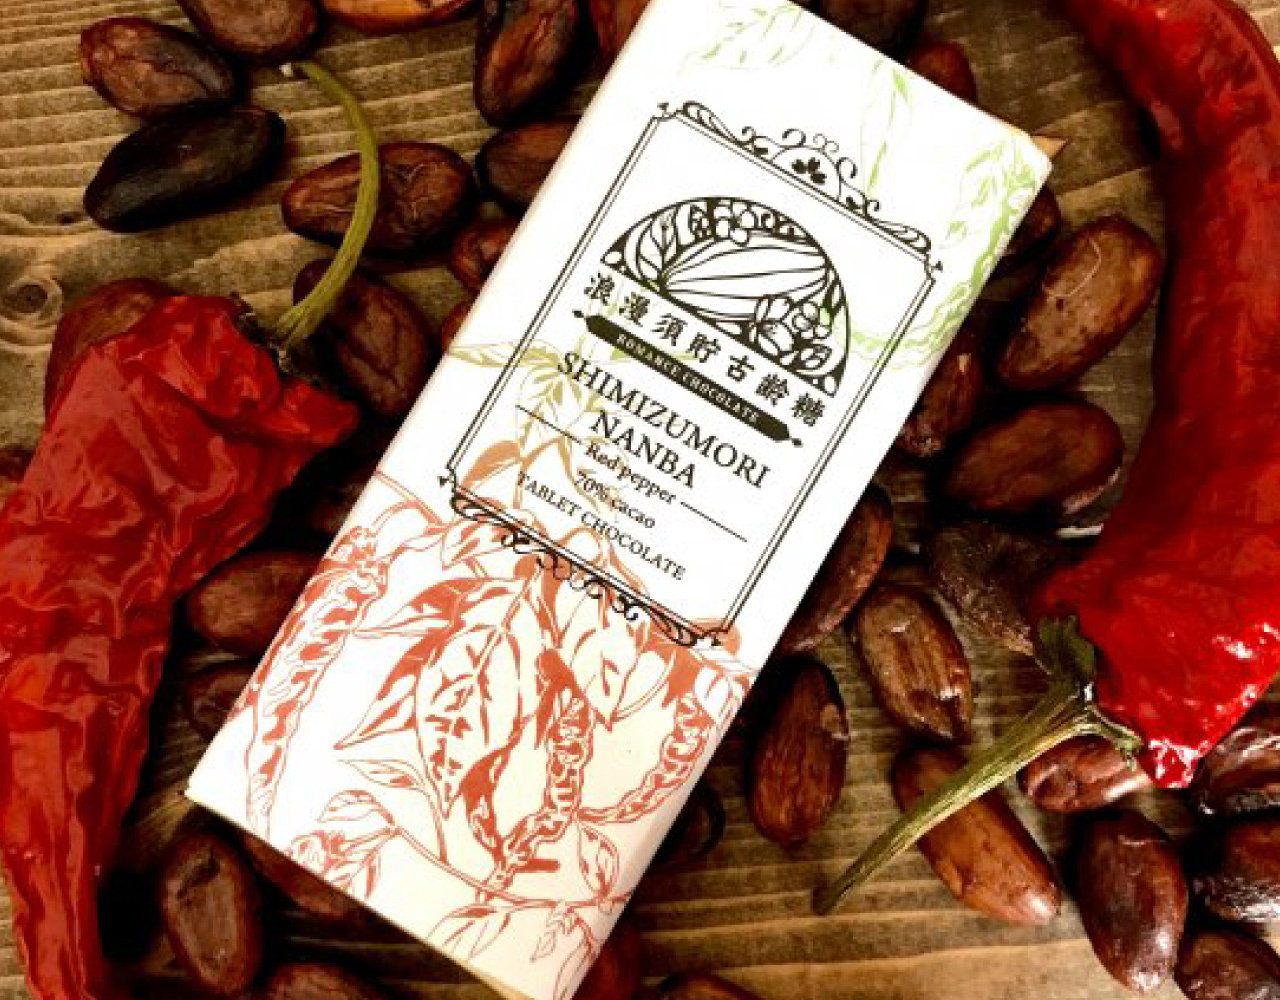 Shimizumori Nanba 70% cacao -Red pepper-(唐辛子入りクラフトチョコレート)